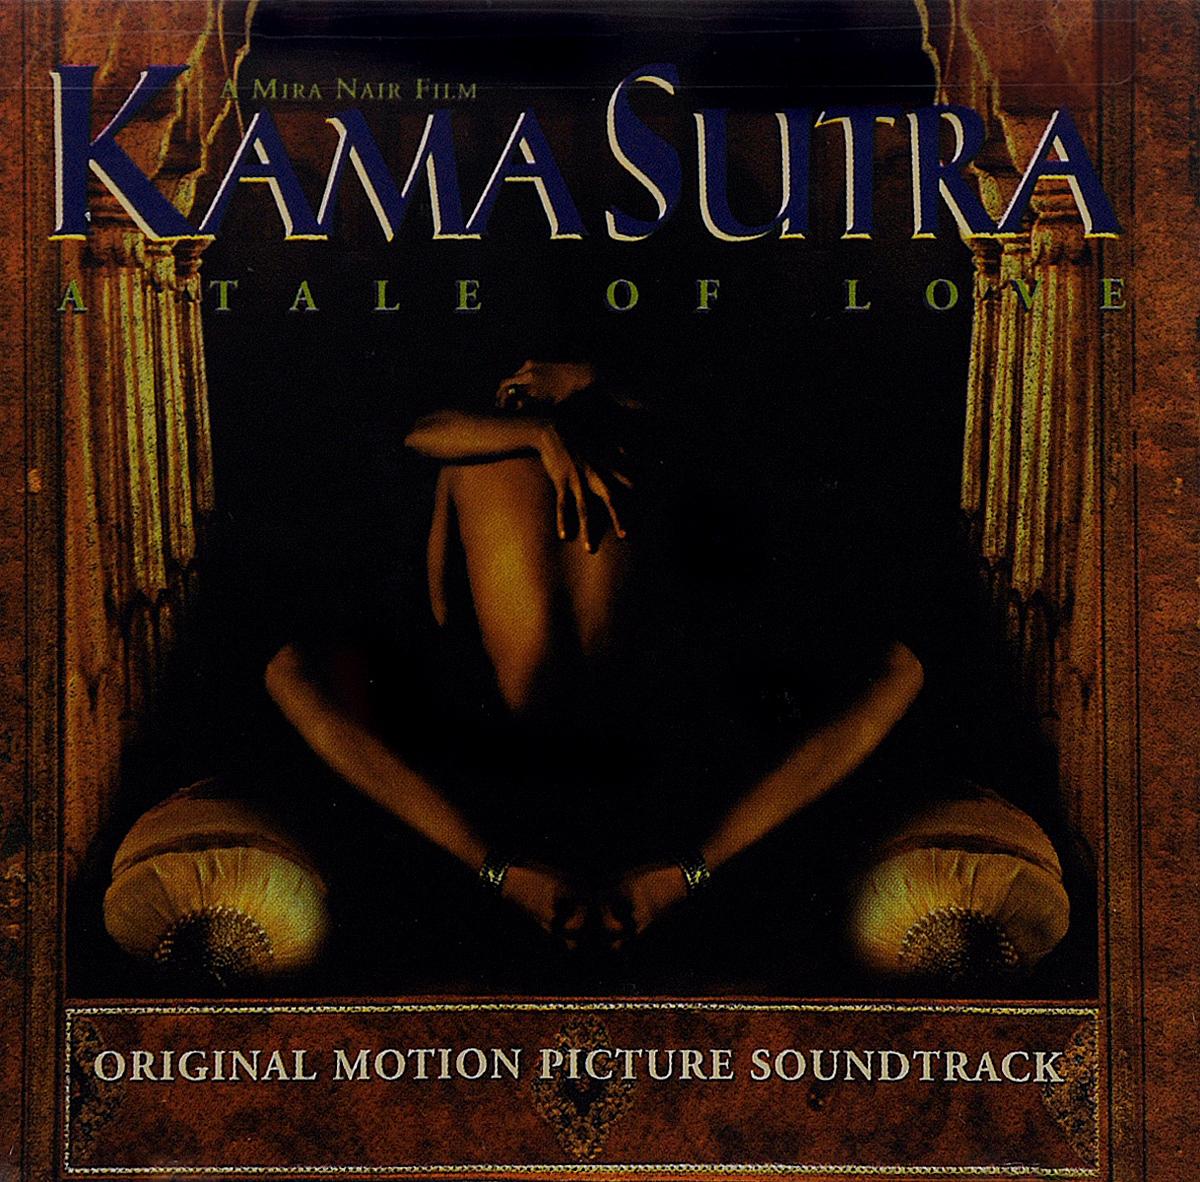 kamasutra-istoriya-lyubvi-1996